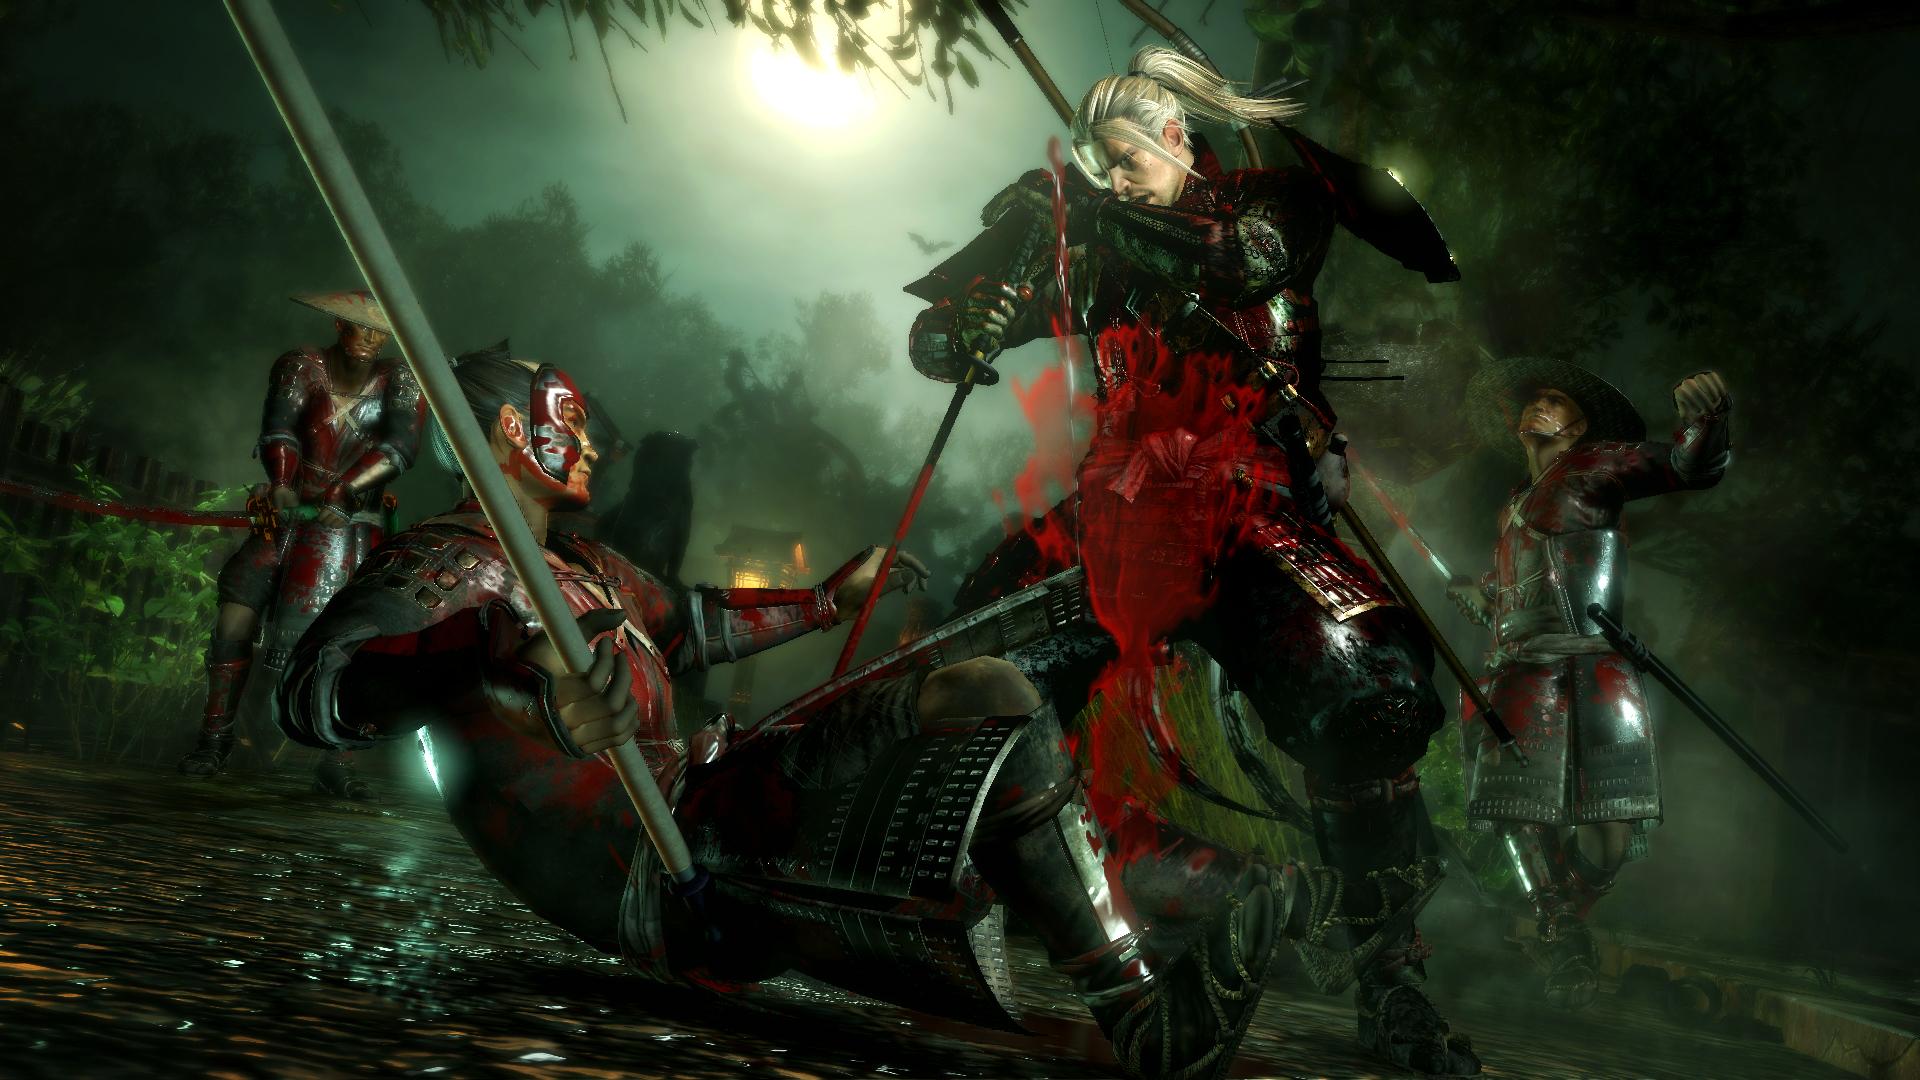 Koei Tecmo's 'Nioh' heads westward on PlayStation 4 | RPG Site